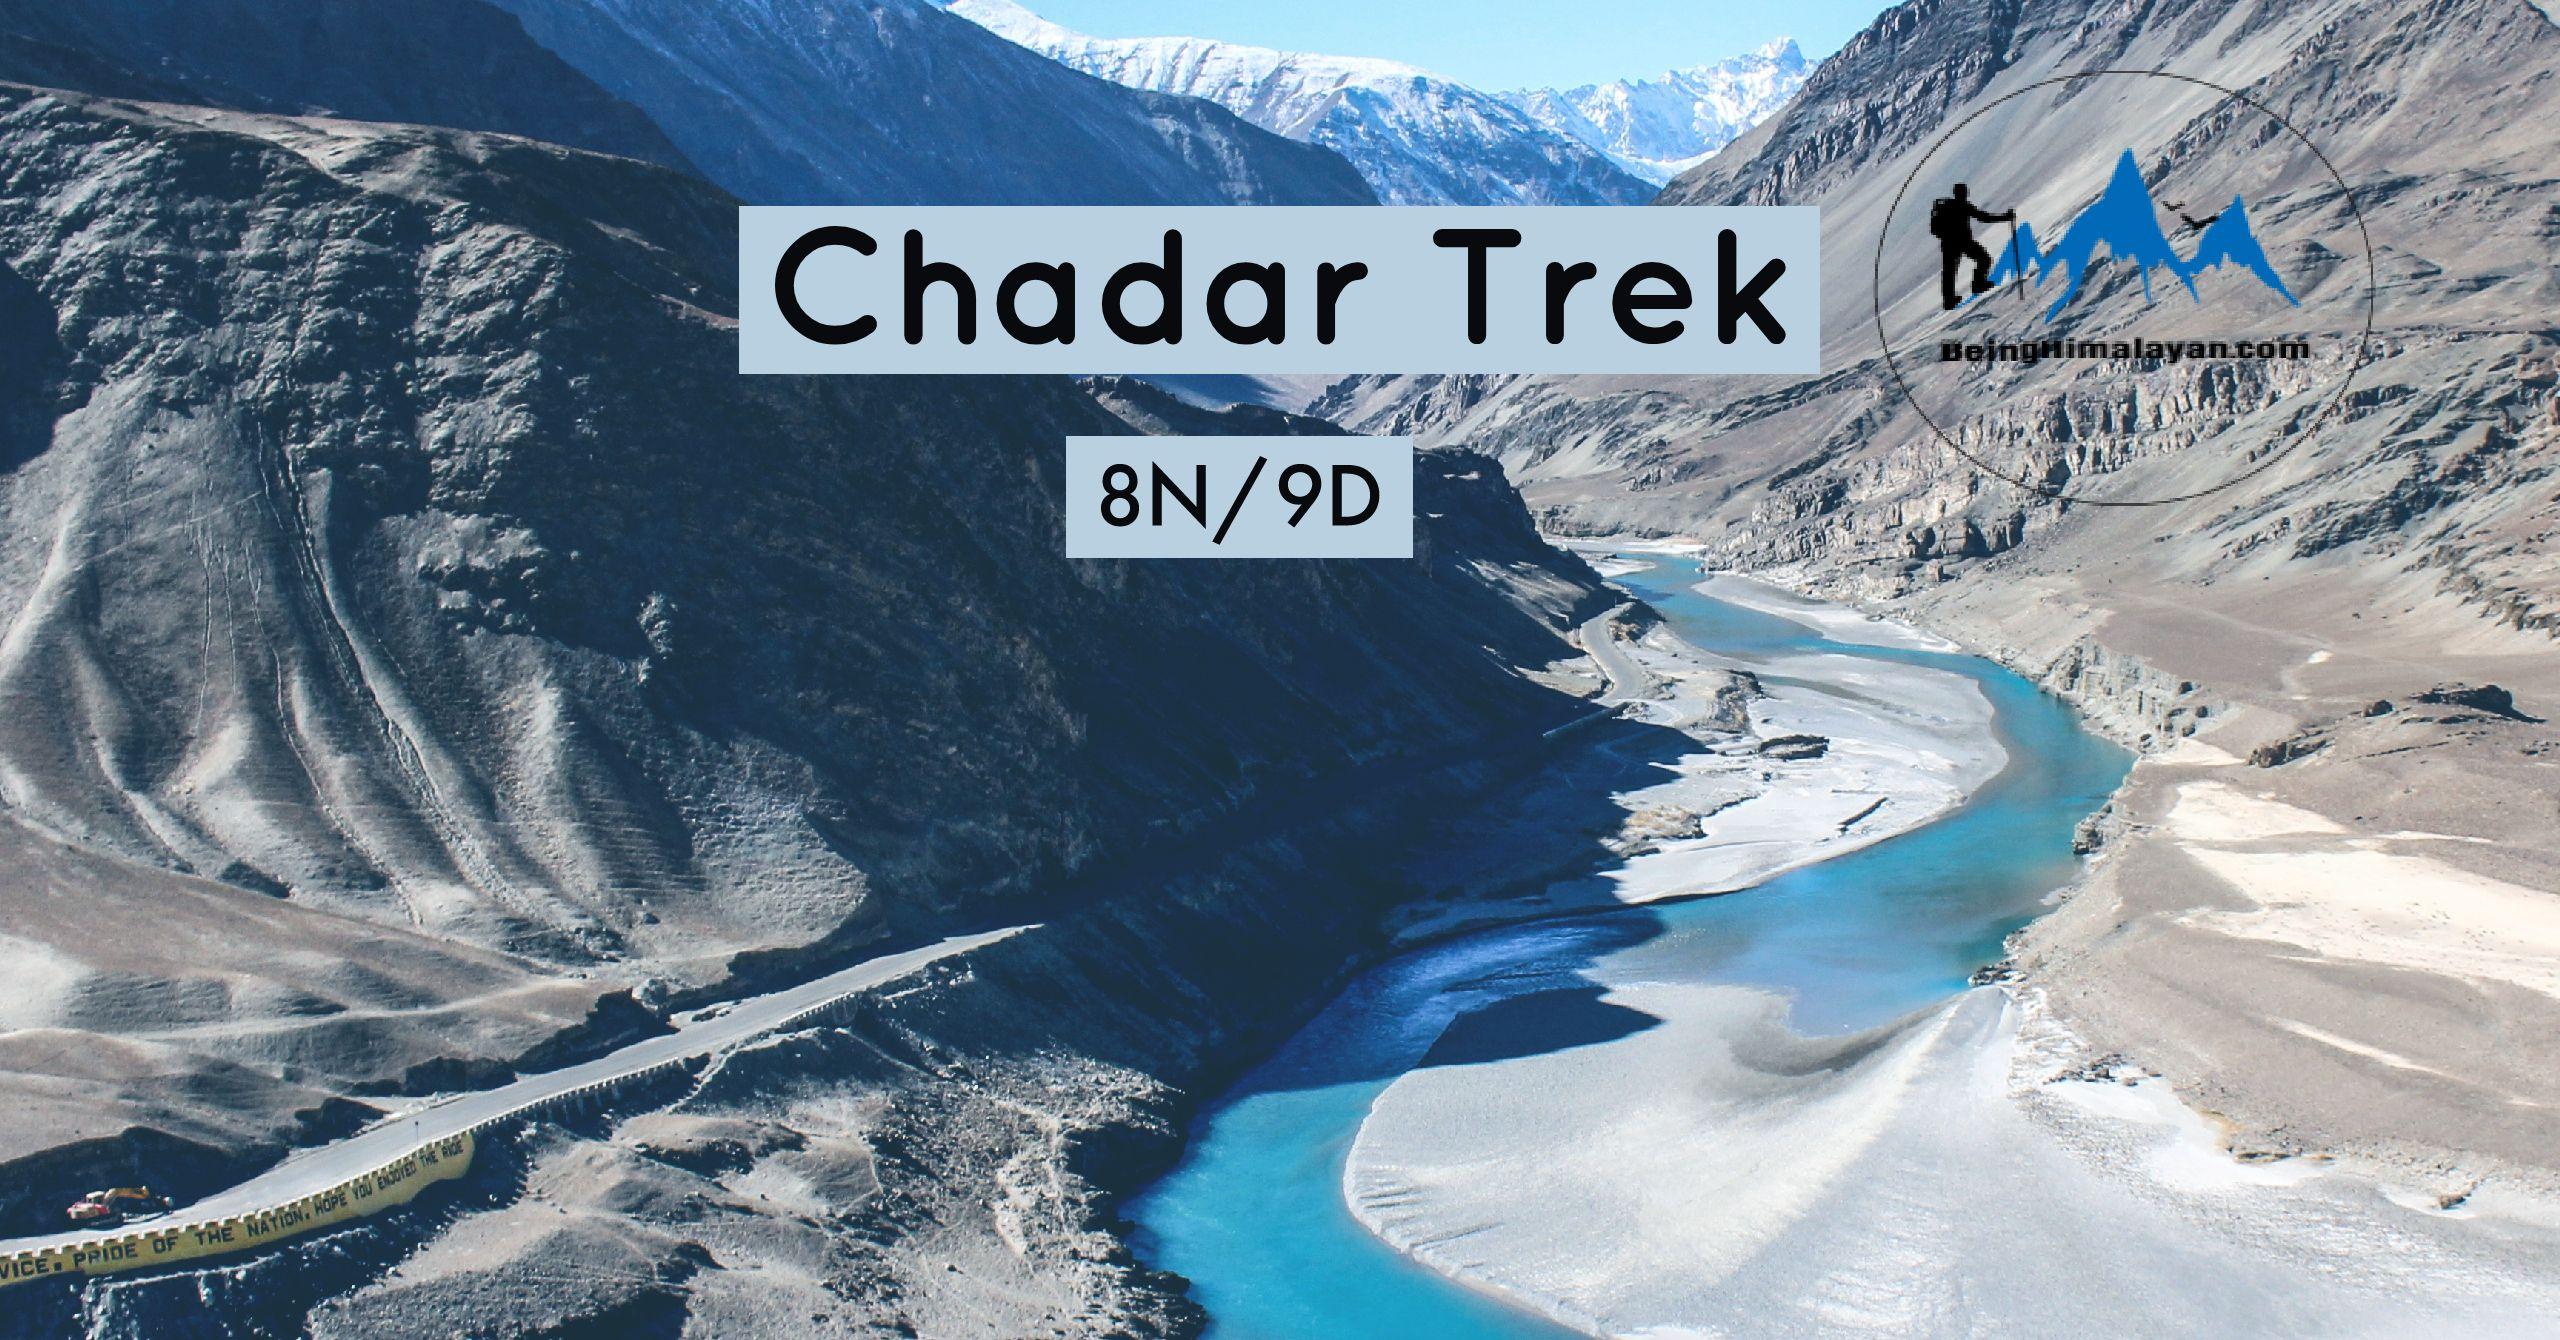 Chadar Trek Booking